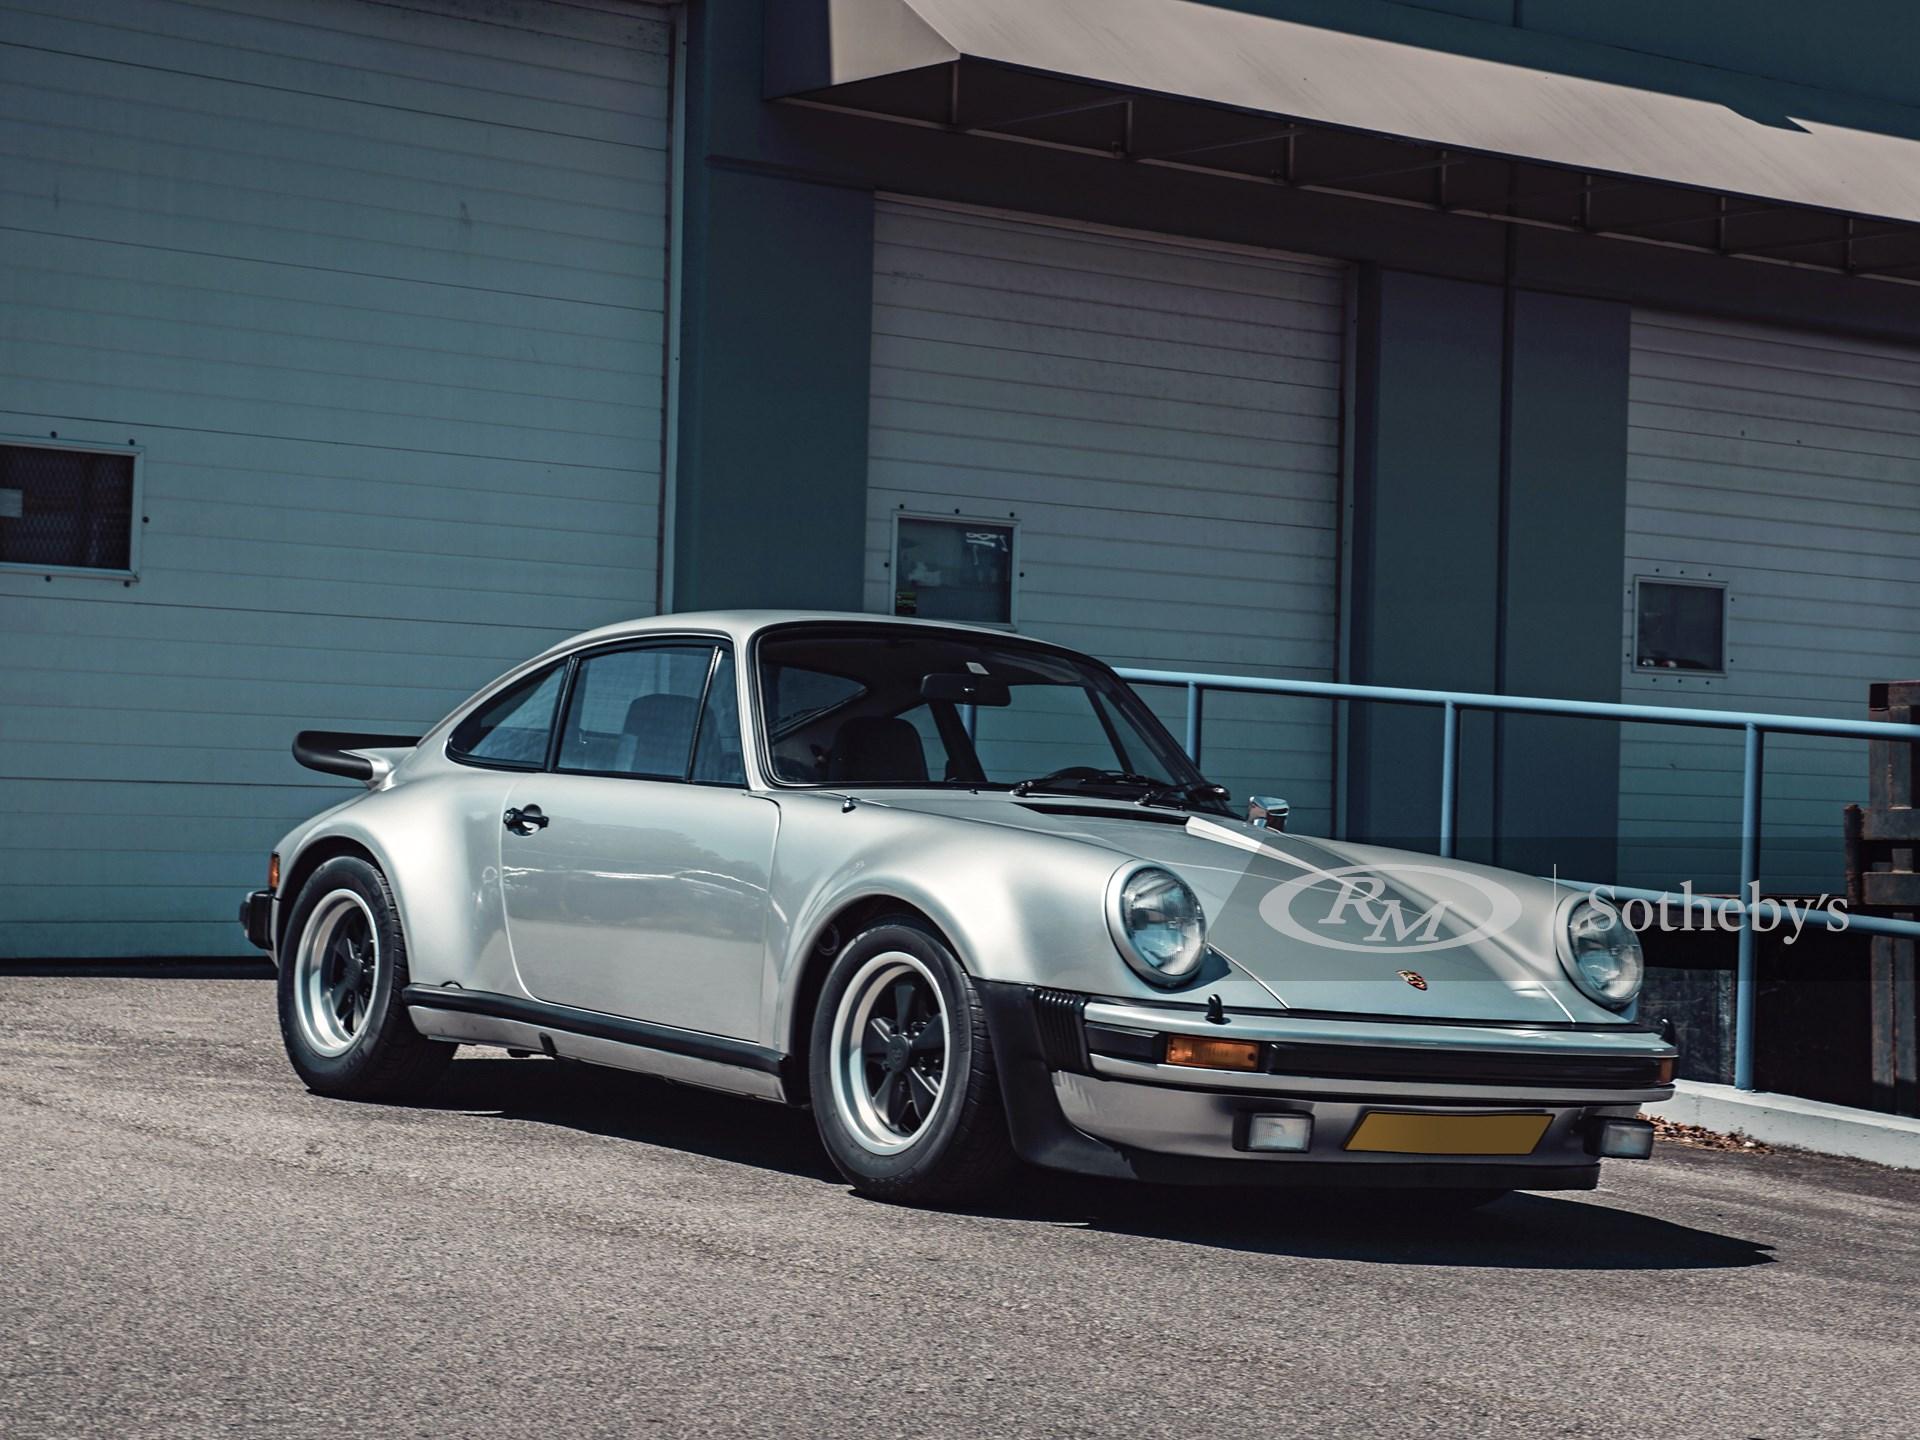 1975 porsche 911 turbo london 2017 rm sotheby s 1975 porsche 911 turbo london 2017